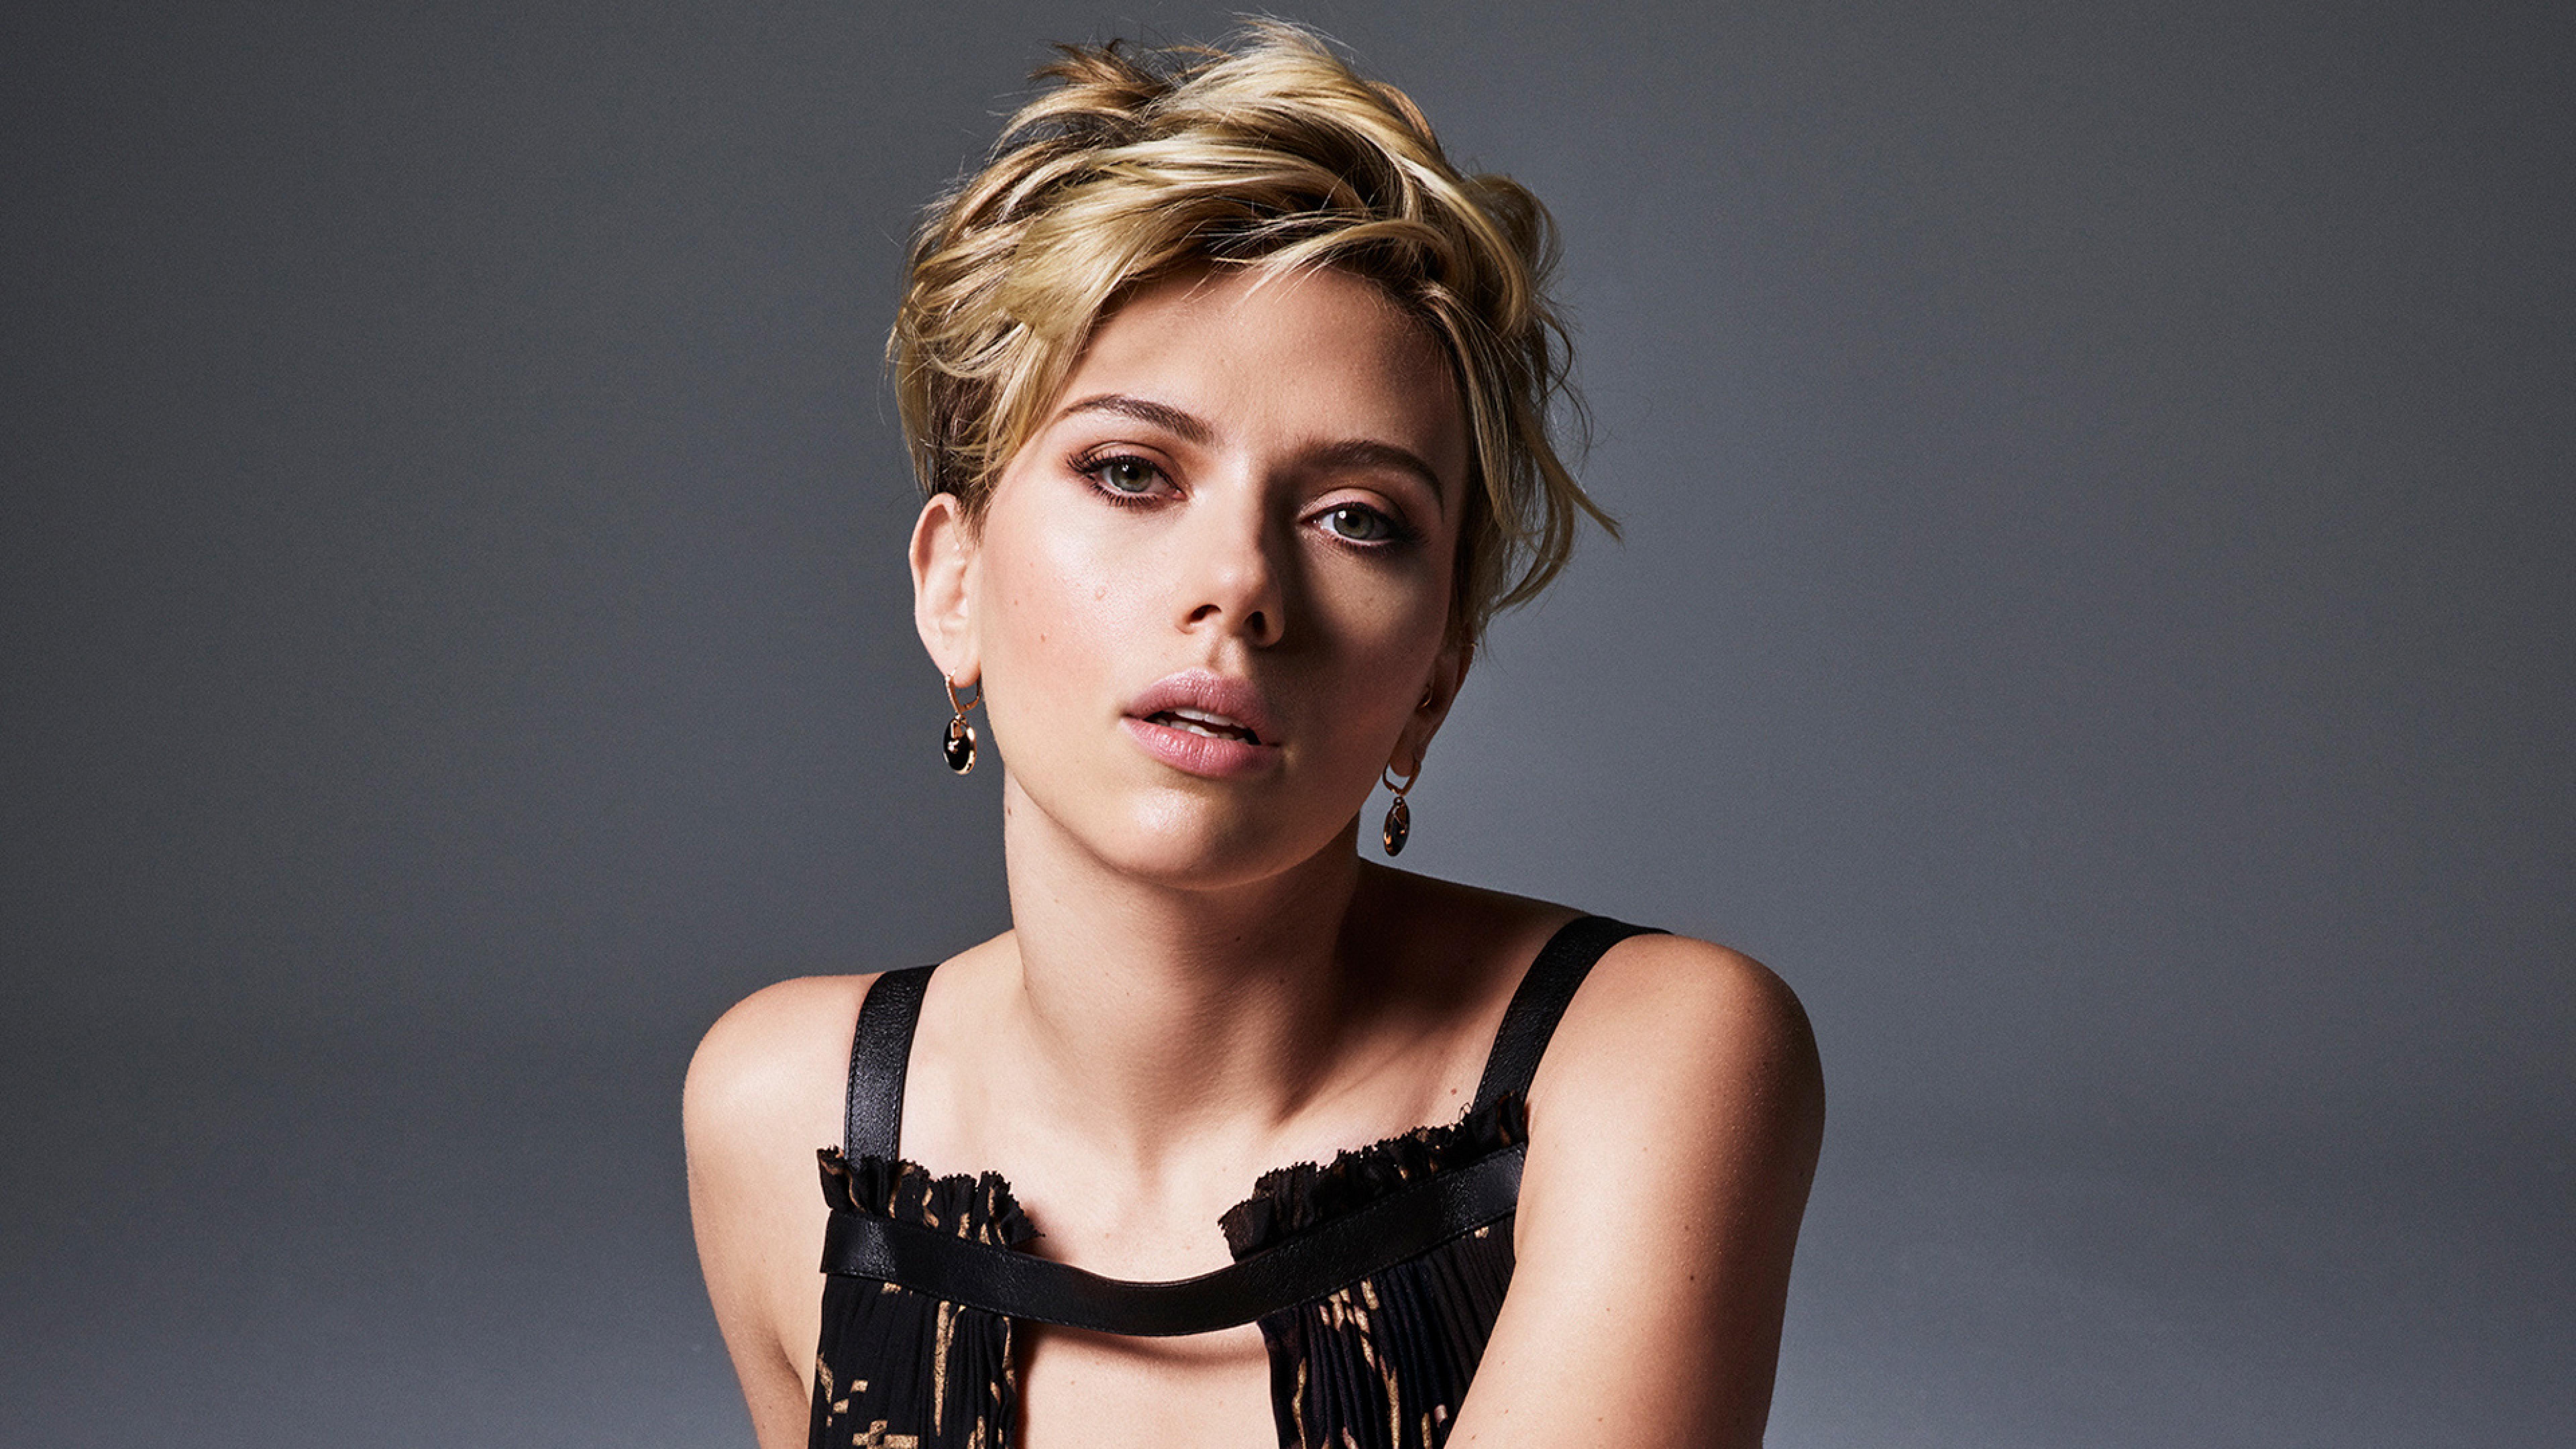 Scarlett Johansson 2017 Wallpaper Background And Photo Gallery